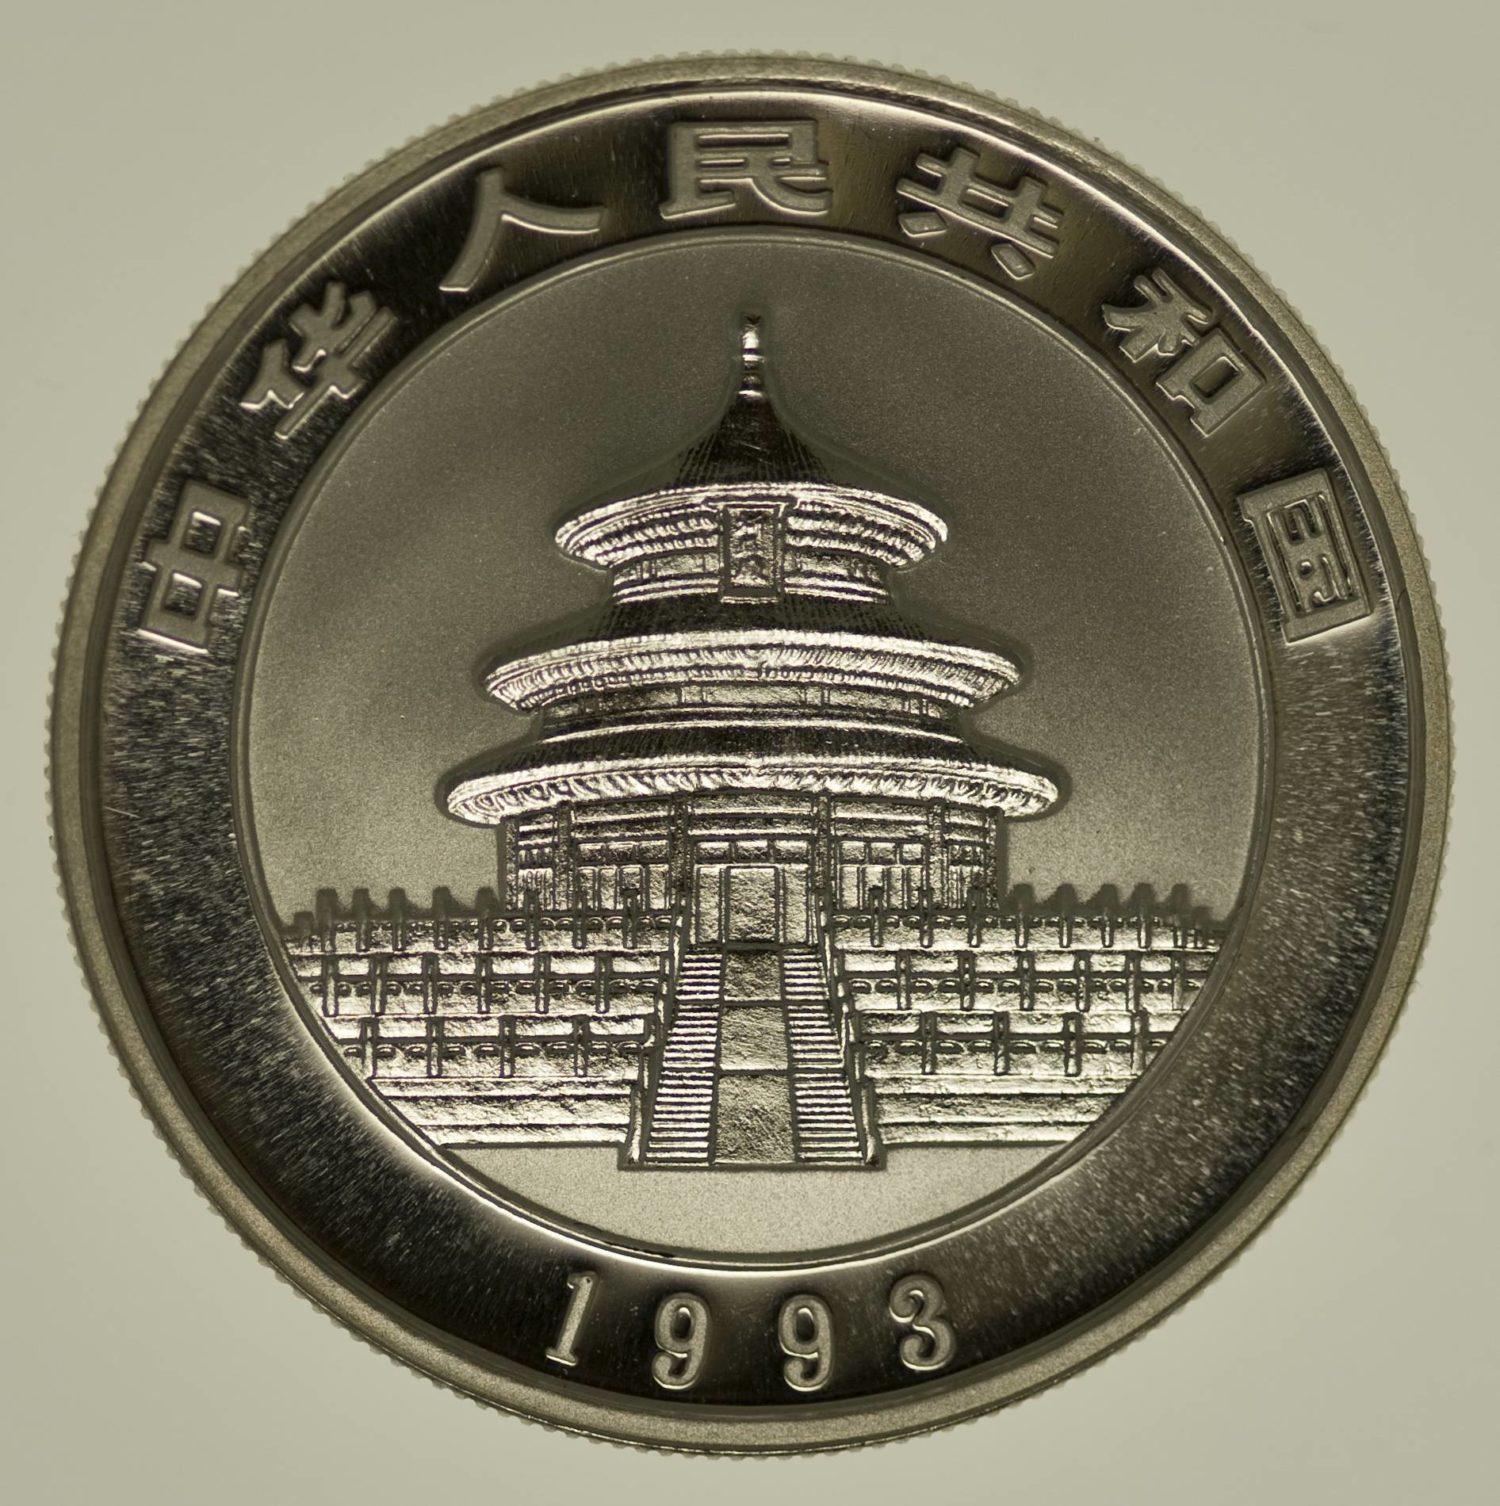 1/2 Unze Silbermünze China Panda 1993, 5 Yuan 15,55 Gramm Silber RAR